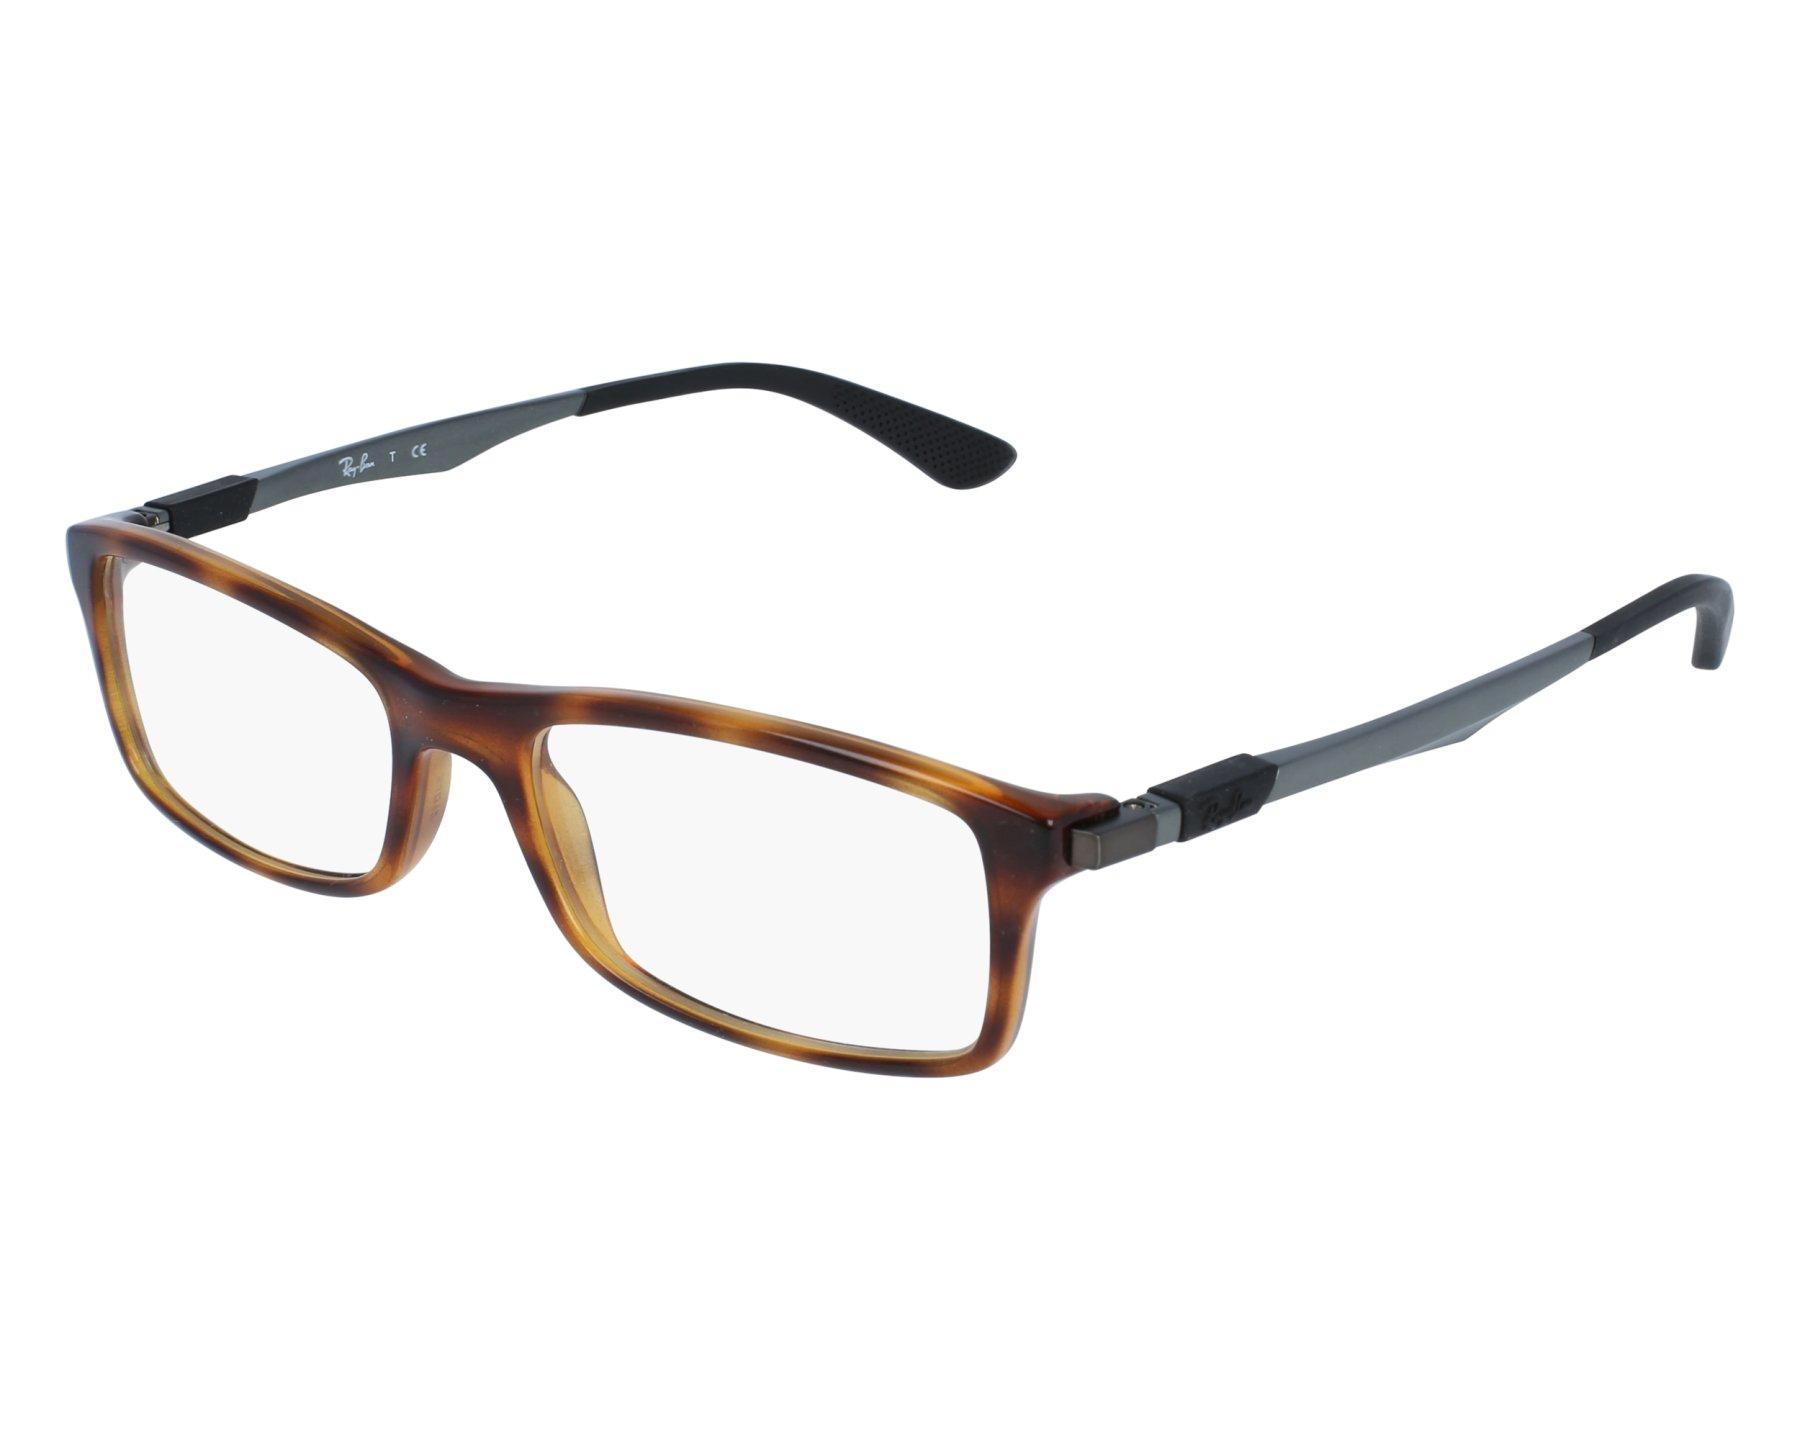 4689d9eb66 eyeglasses Ray-Ban RX-7017 5687 54-17 Havana Blue front view